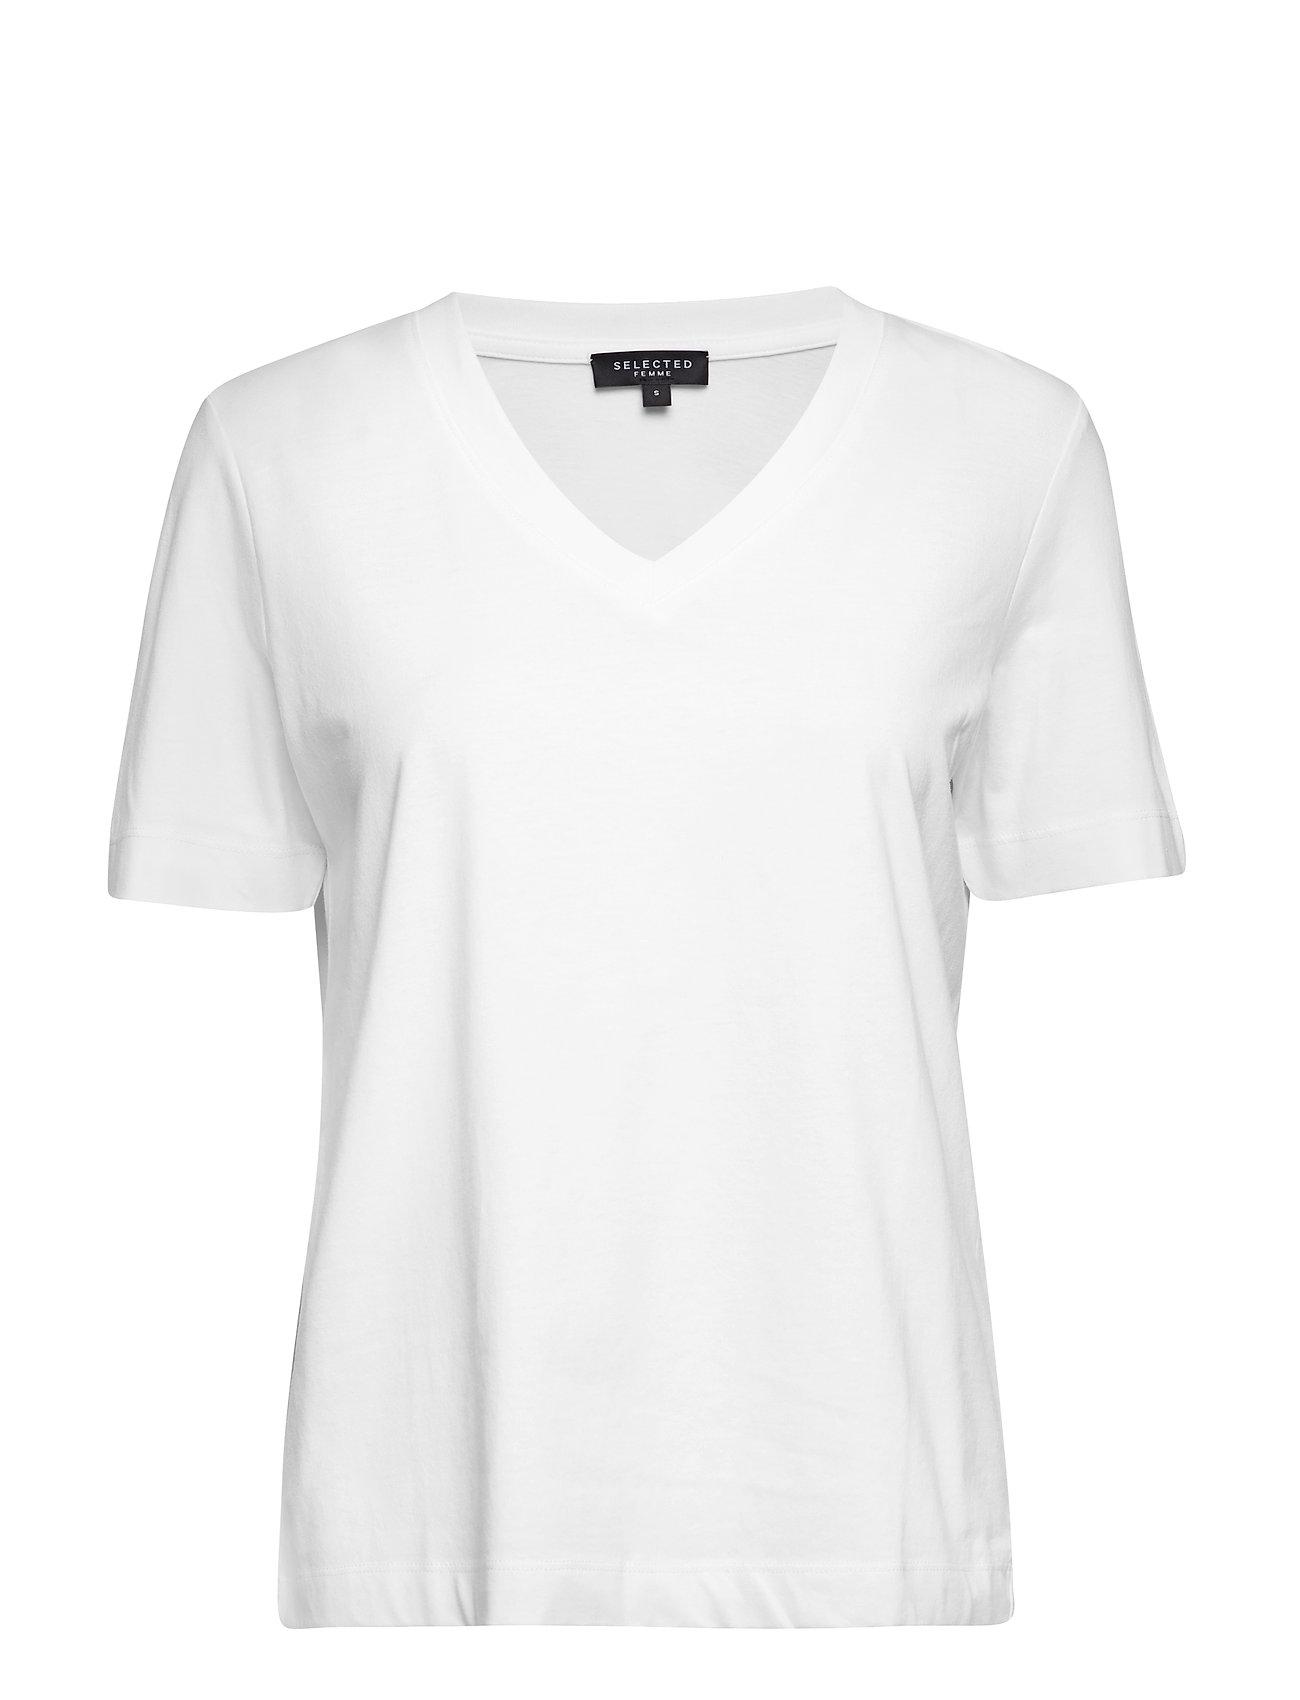 Selected Femme SLFSTANDARD SS V-NECK TEE NOOS - BRIGHT WHITE